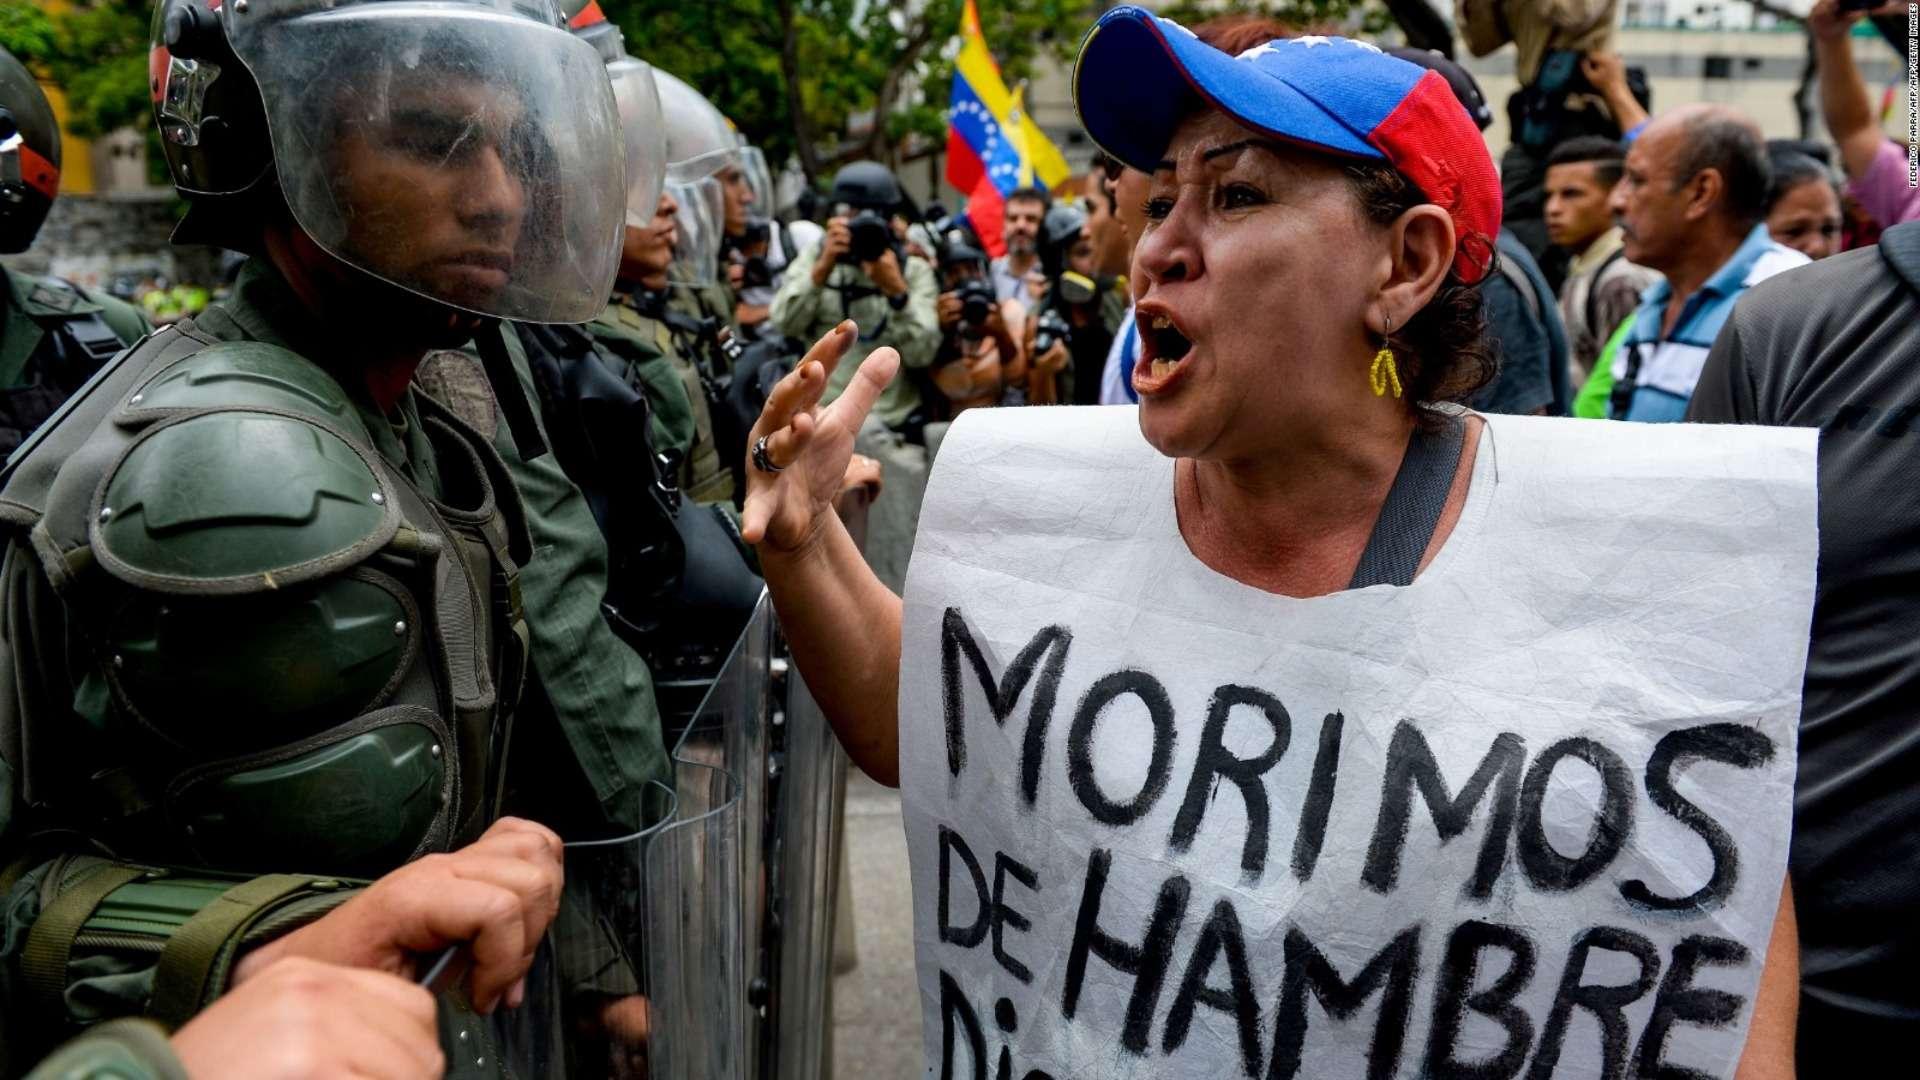 'Saqueamos o morimos de hambre': la escasez de alimentos en Venezuela